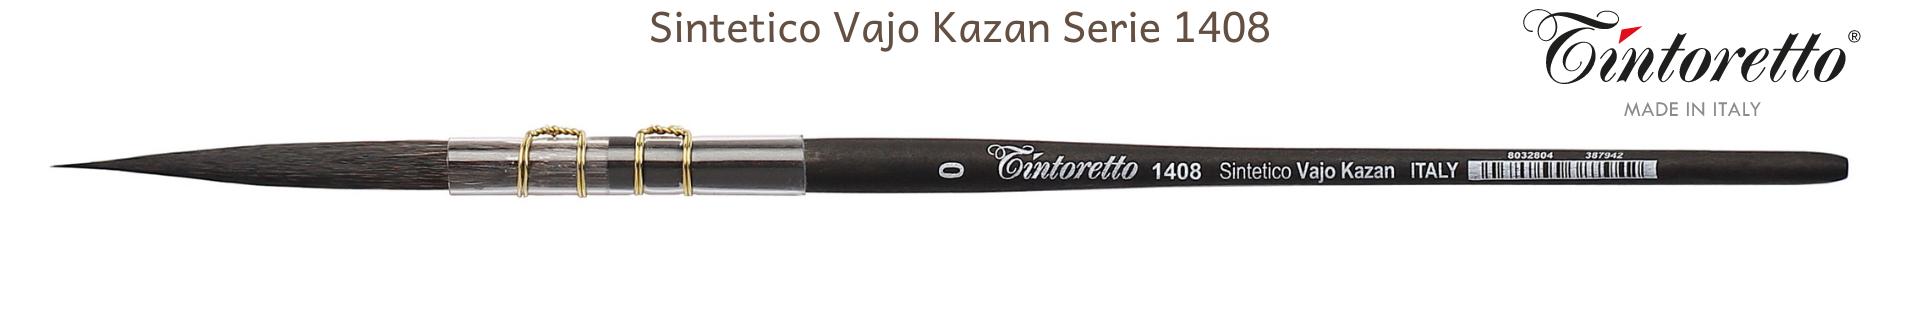 Tintoretto Vajo Kazan 1408